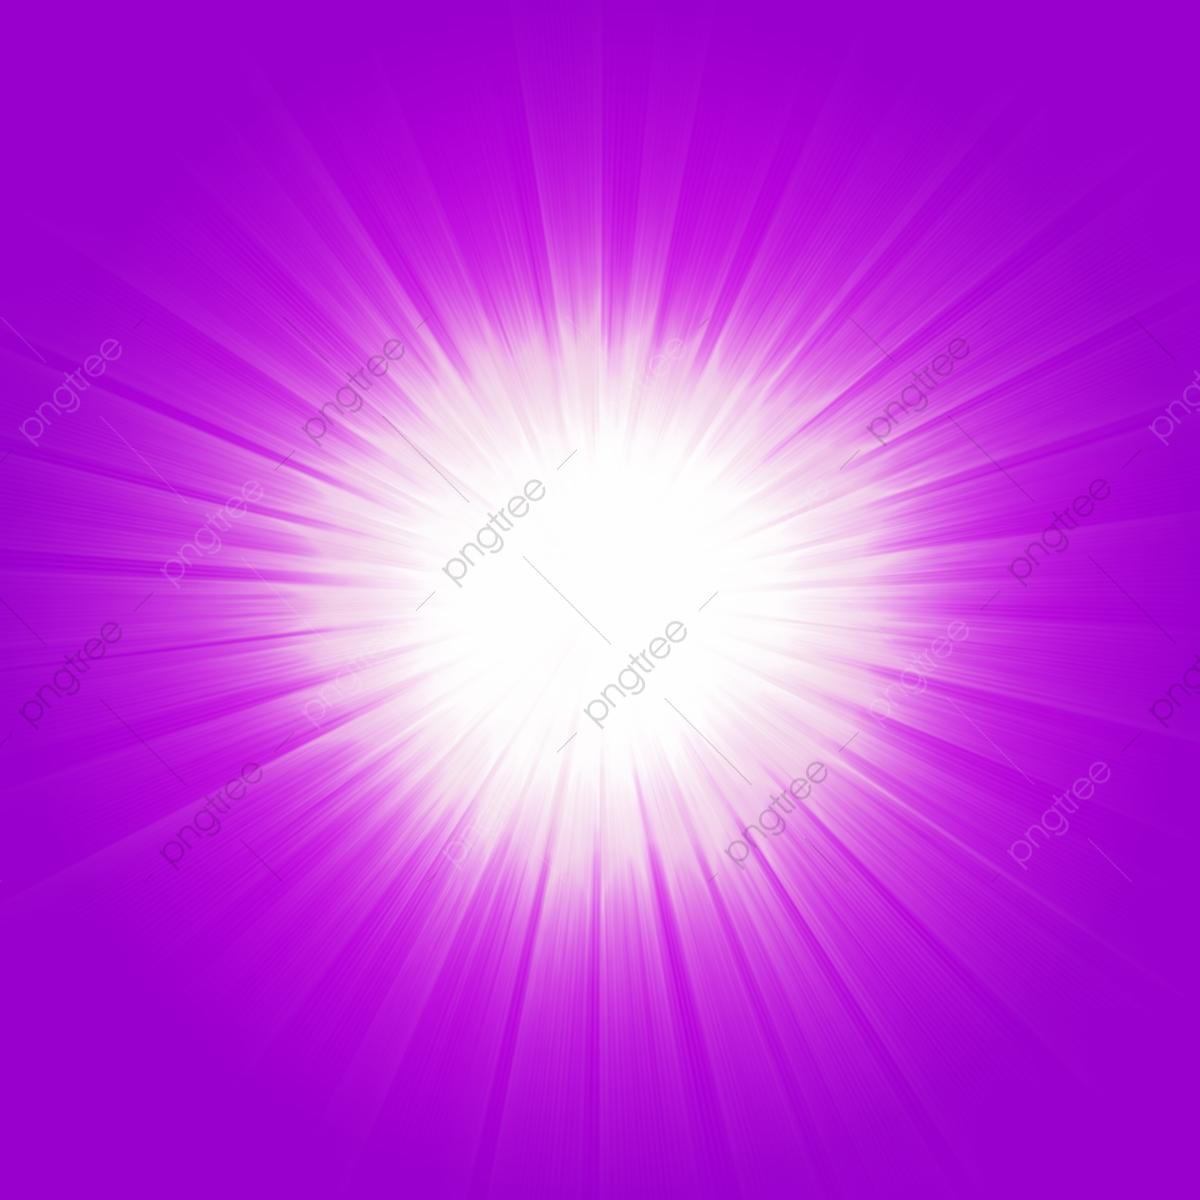 Sun background rays png. Burst clipart purple